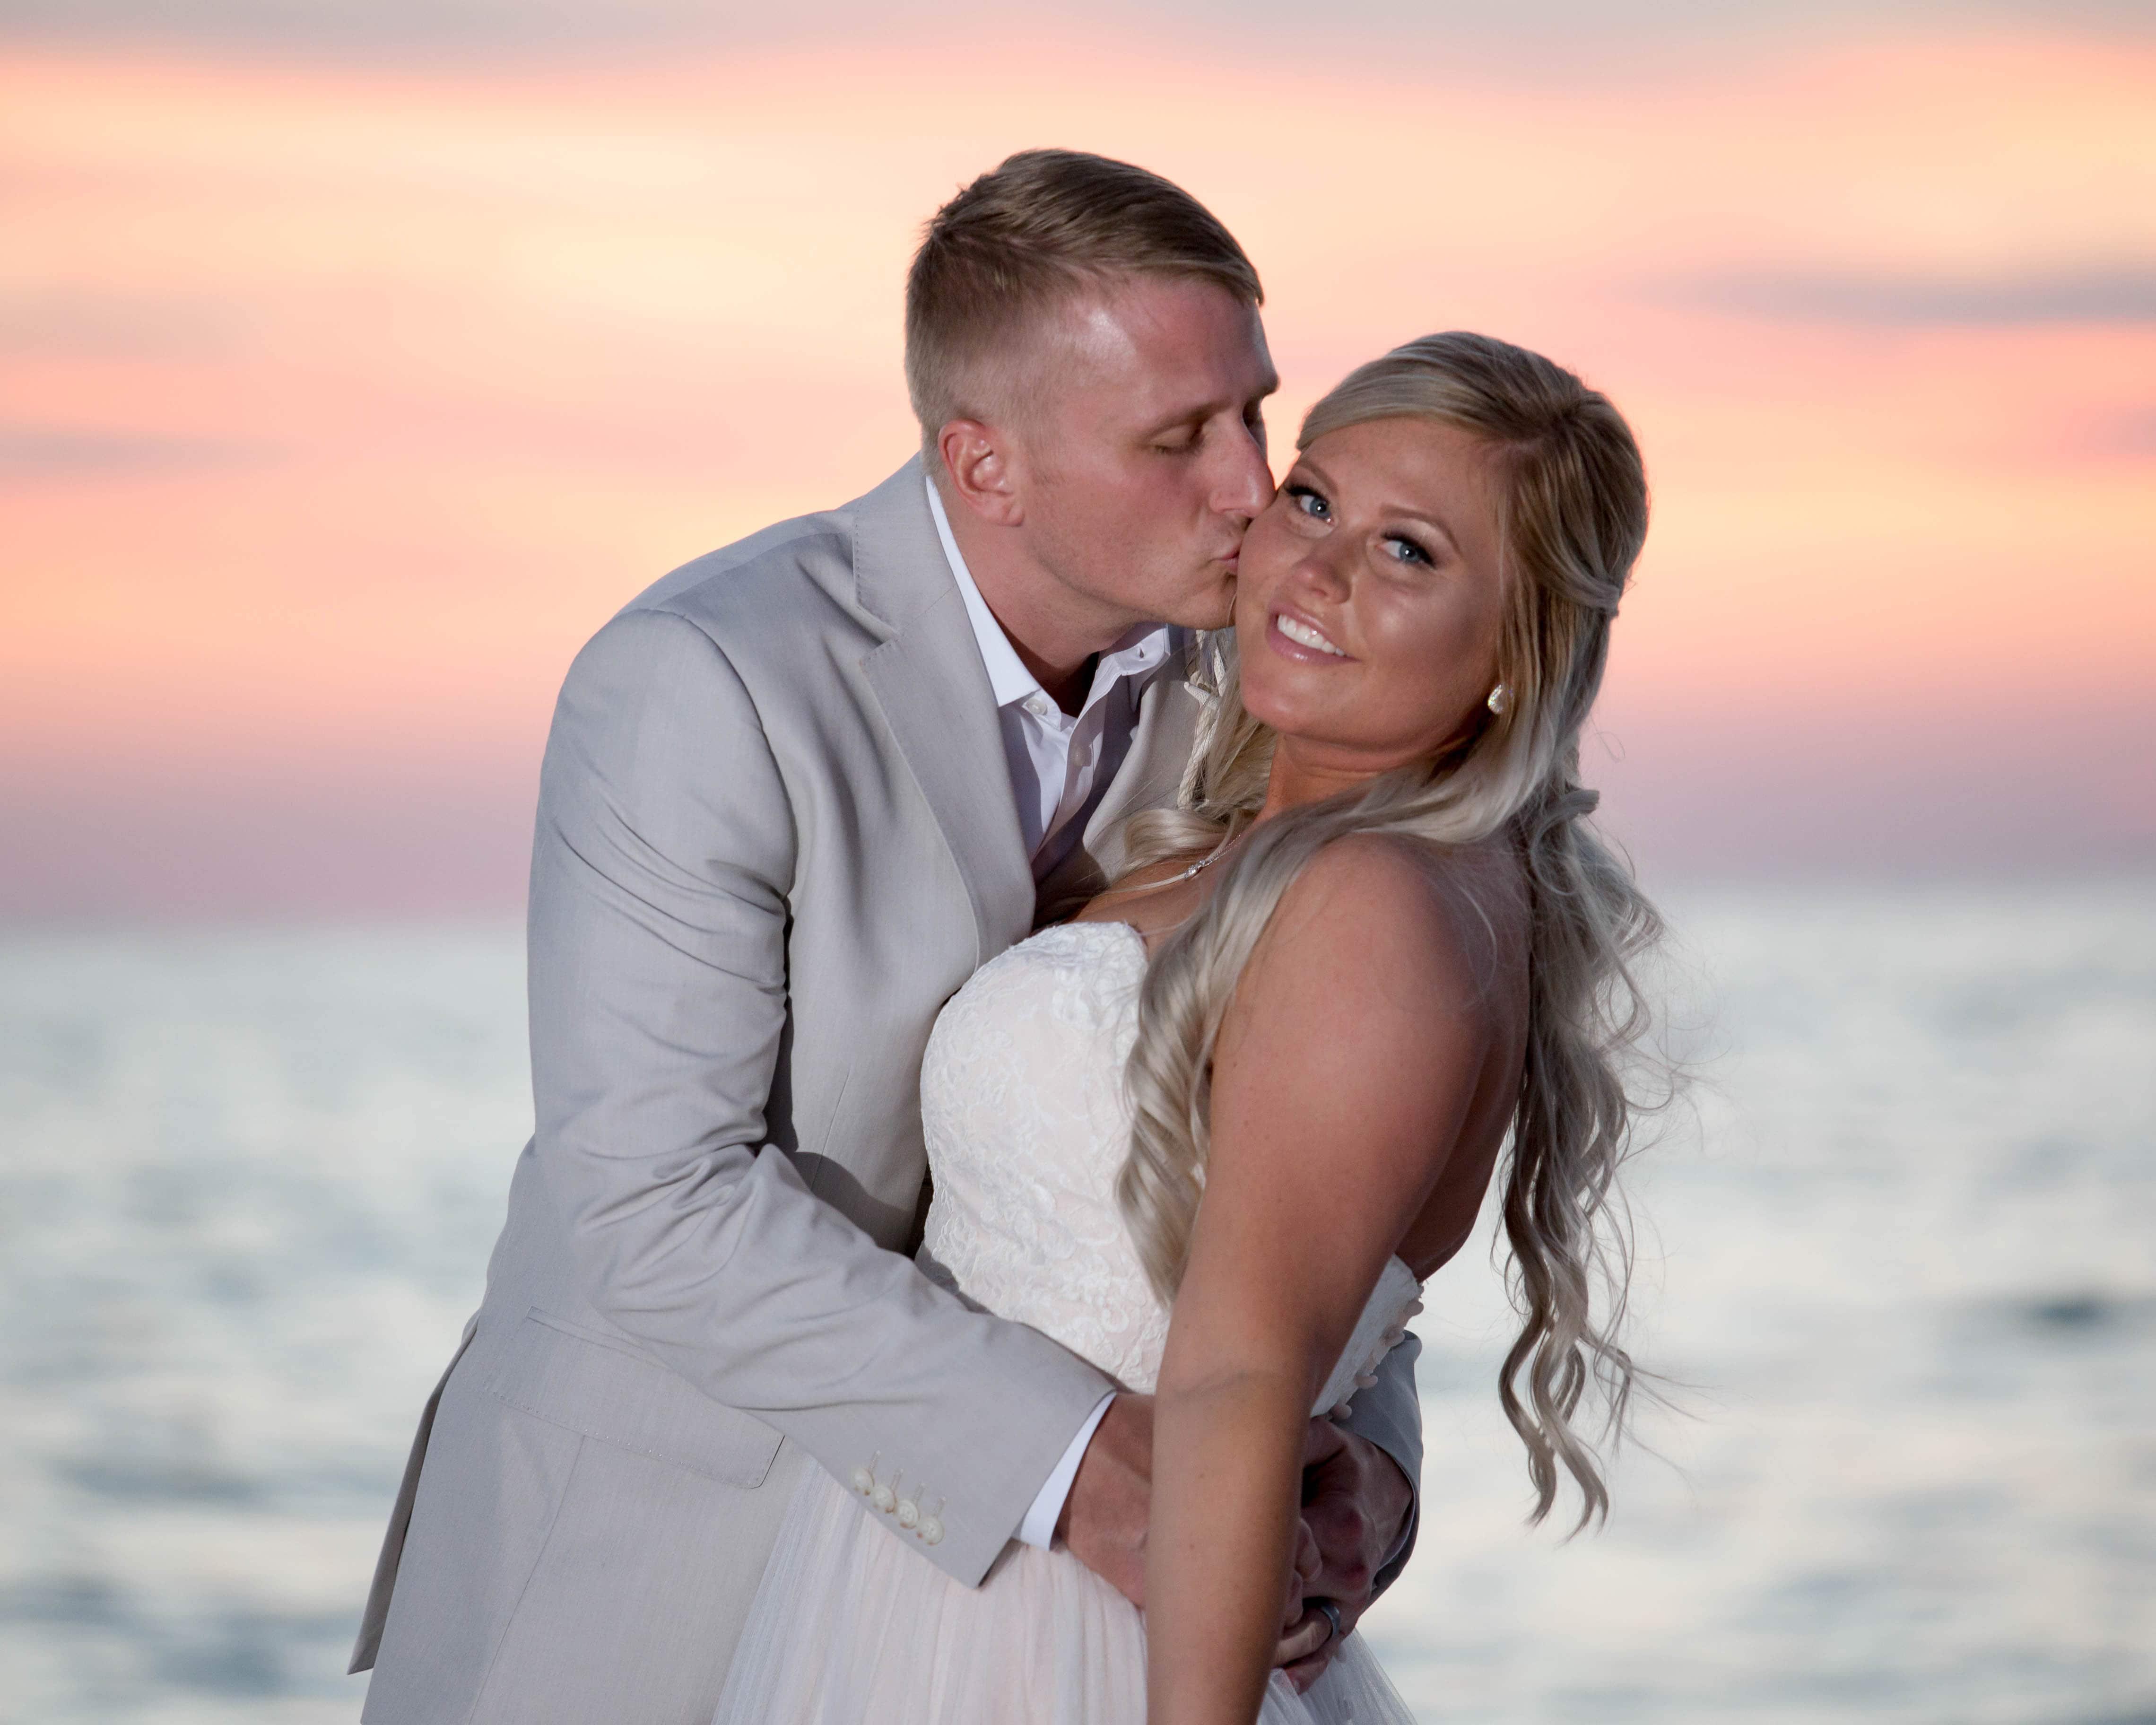 sunset wedding kiss in destin